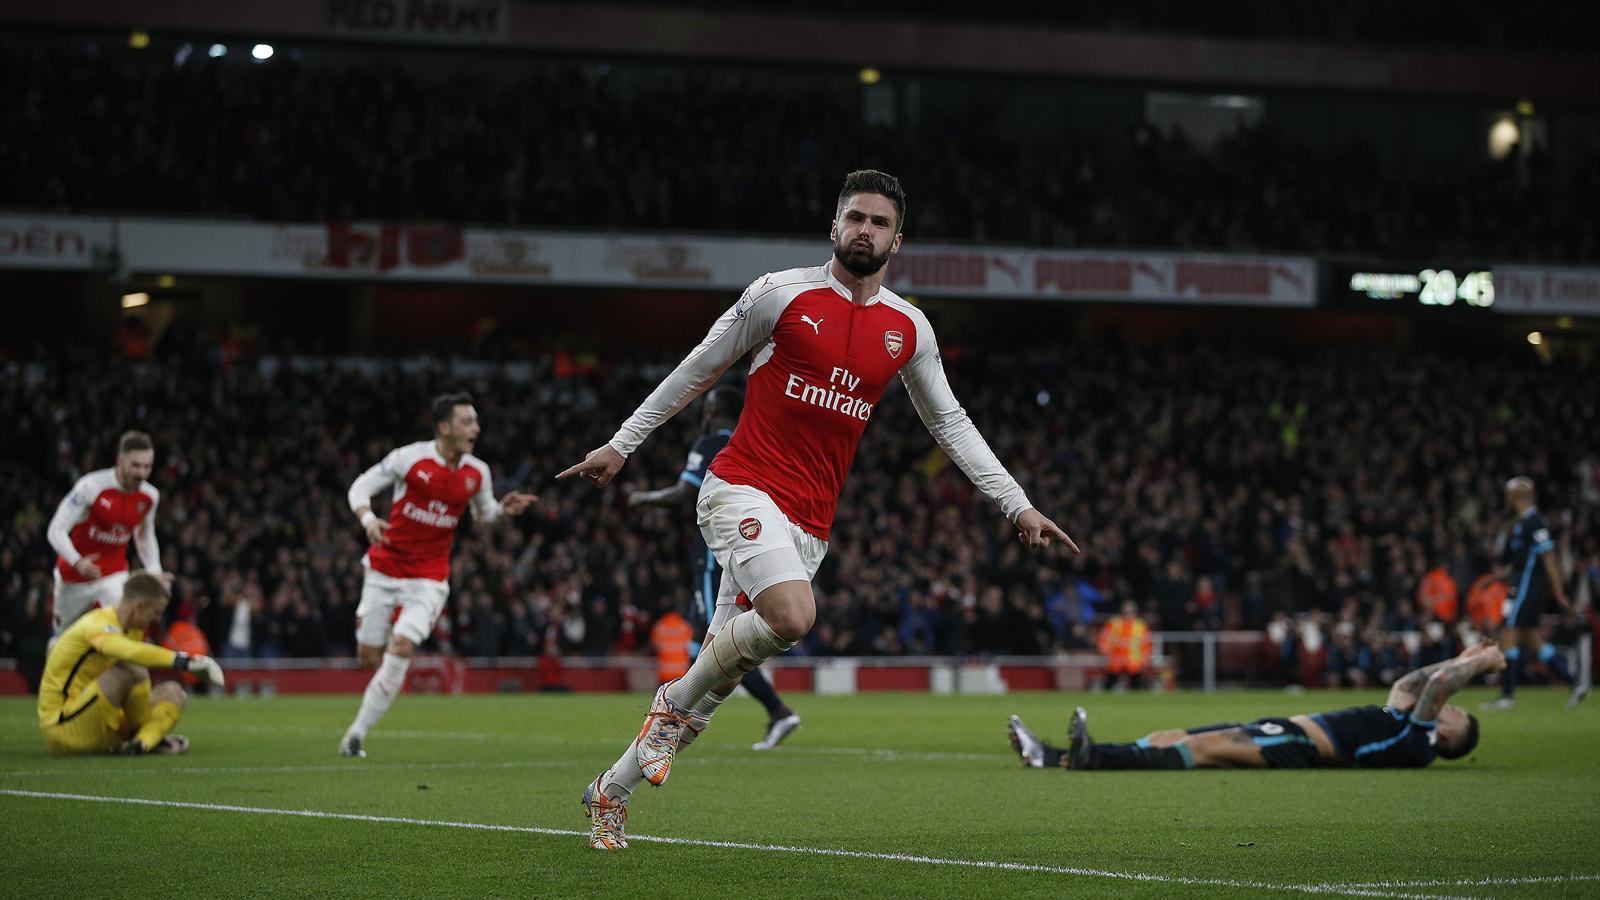 Oliveir Giroud (Arsenal) celebrates his goal v Manchester City